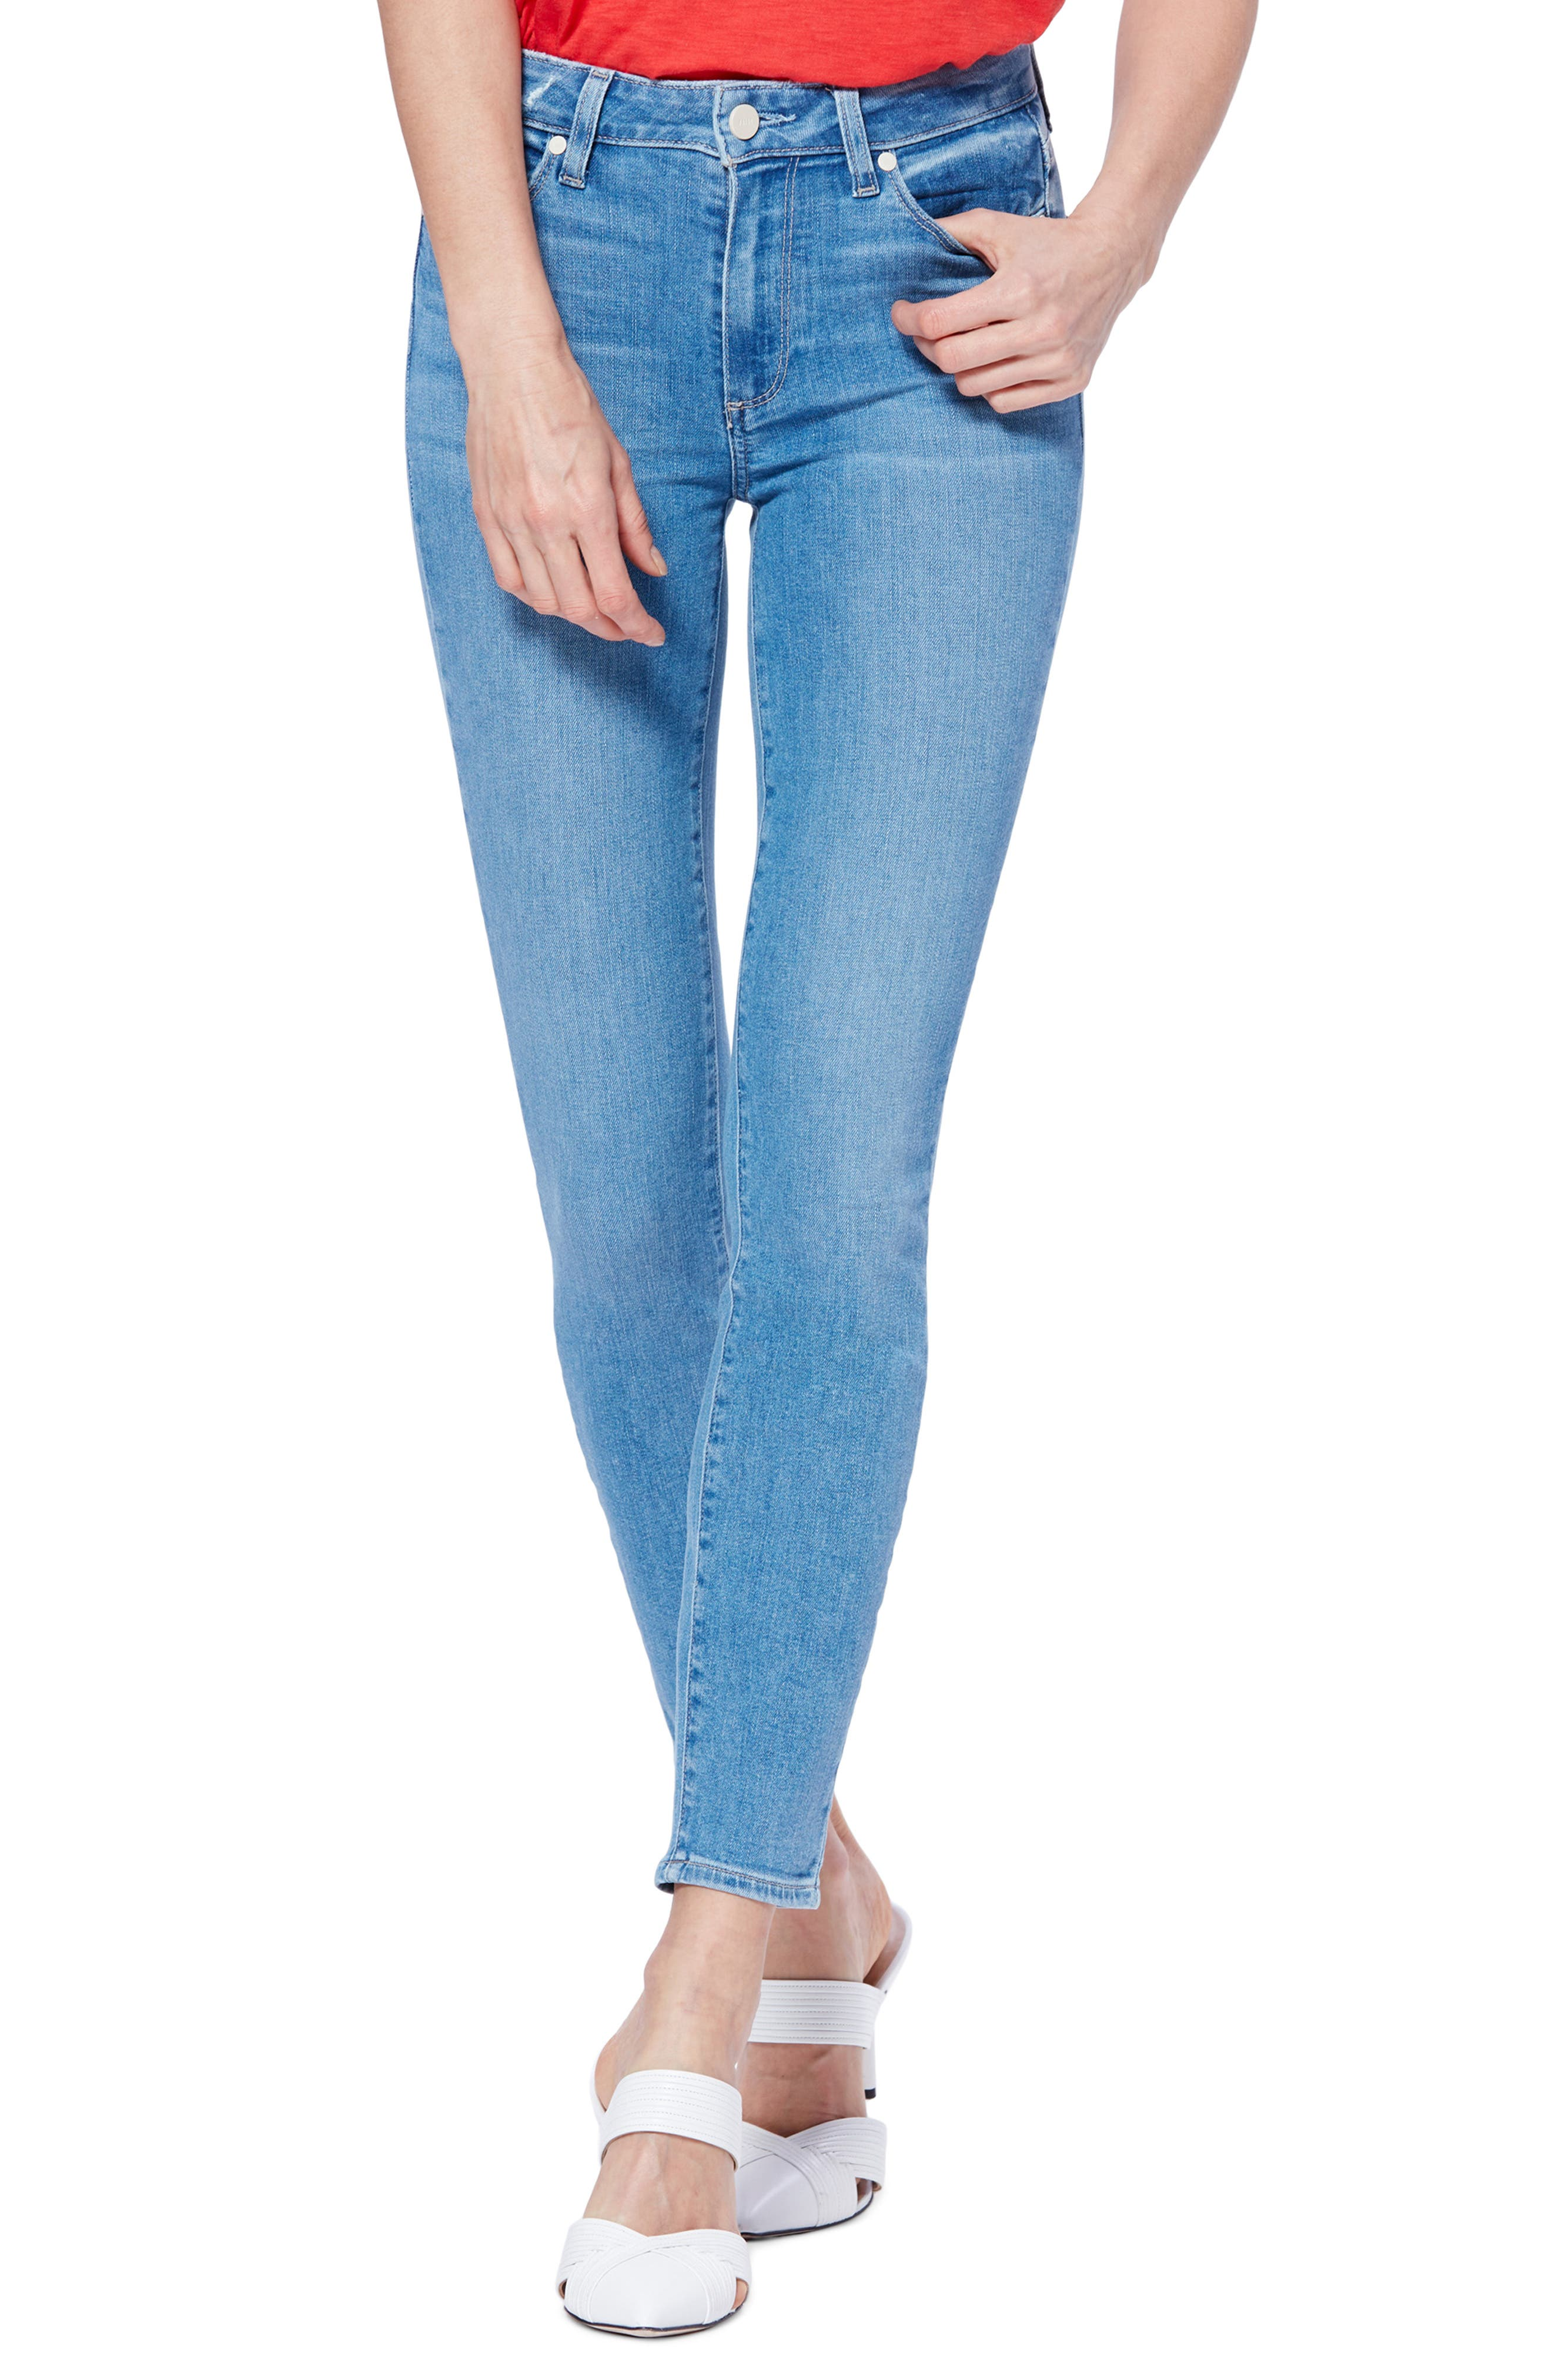 Transcend Vintage - Hoxton High Waist Ankle Skinny Jeans, Main, color, 400